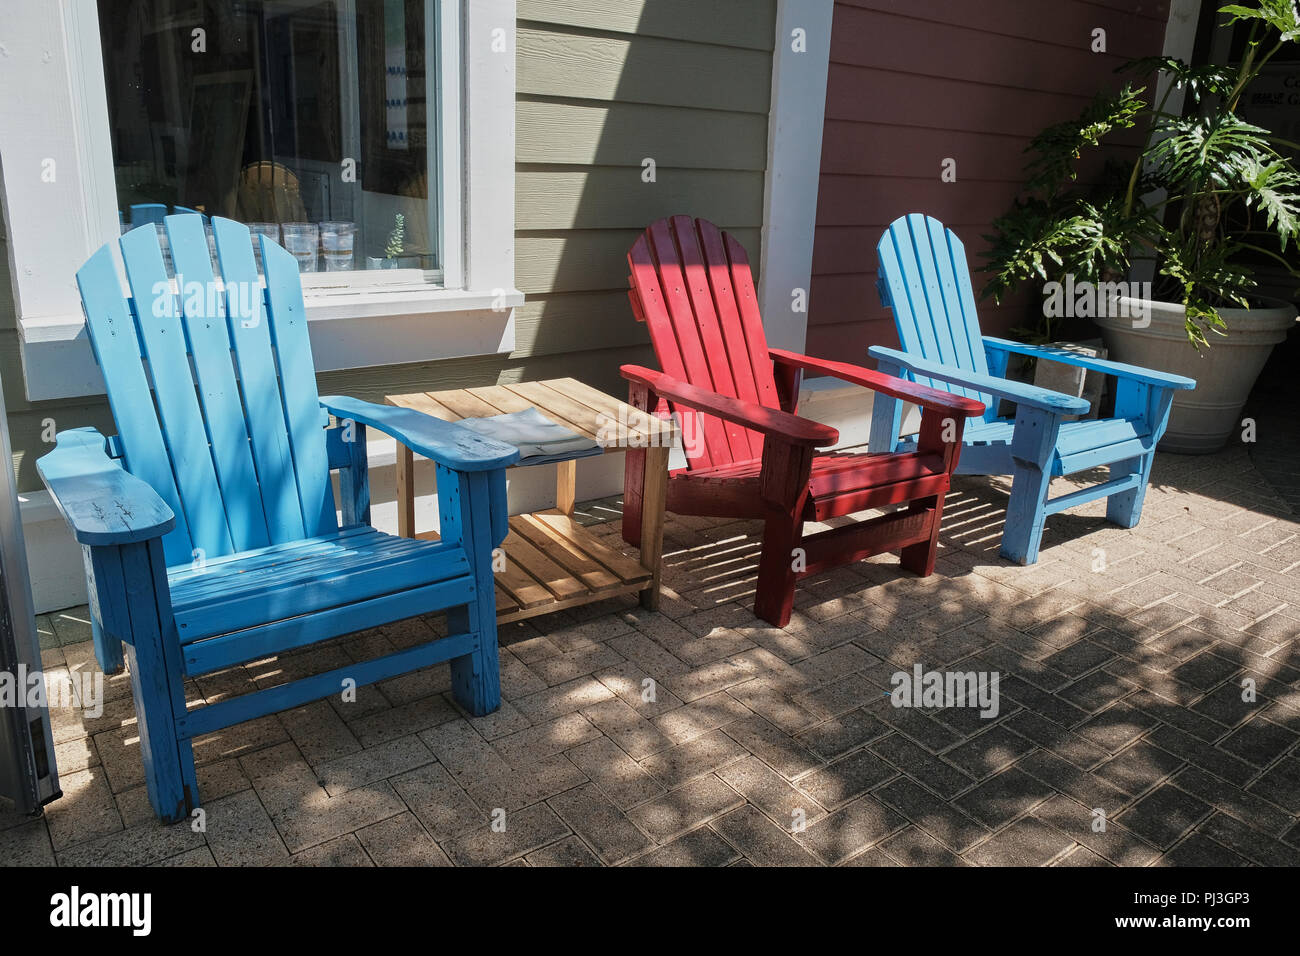 Leere Bunten Adirondack Stuhle Auf Stein Terrasse In Florida Usa Stockfotografie Alamy